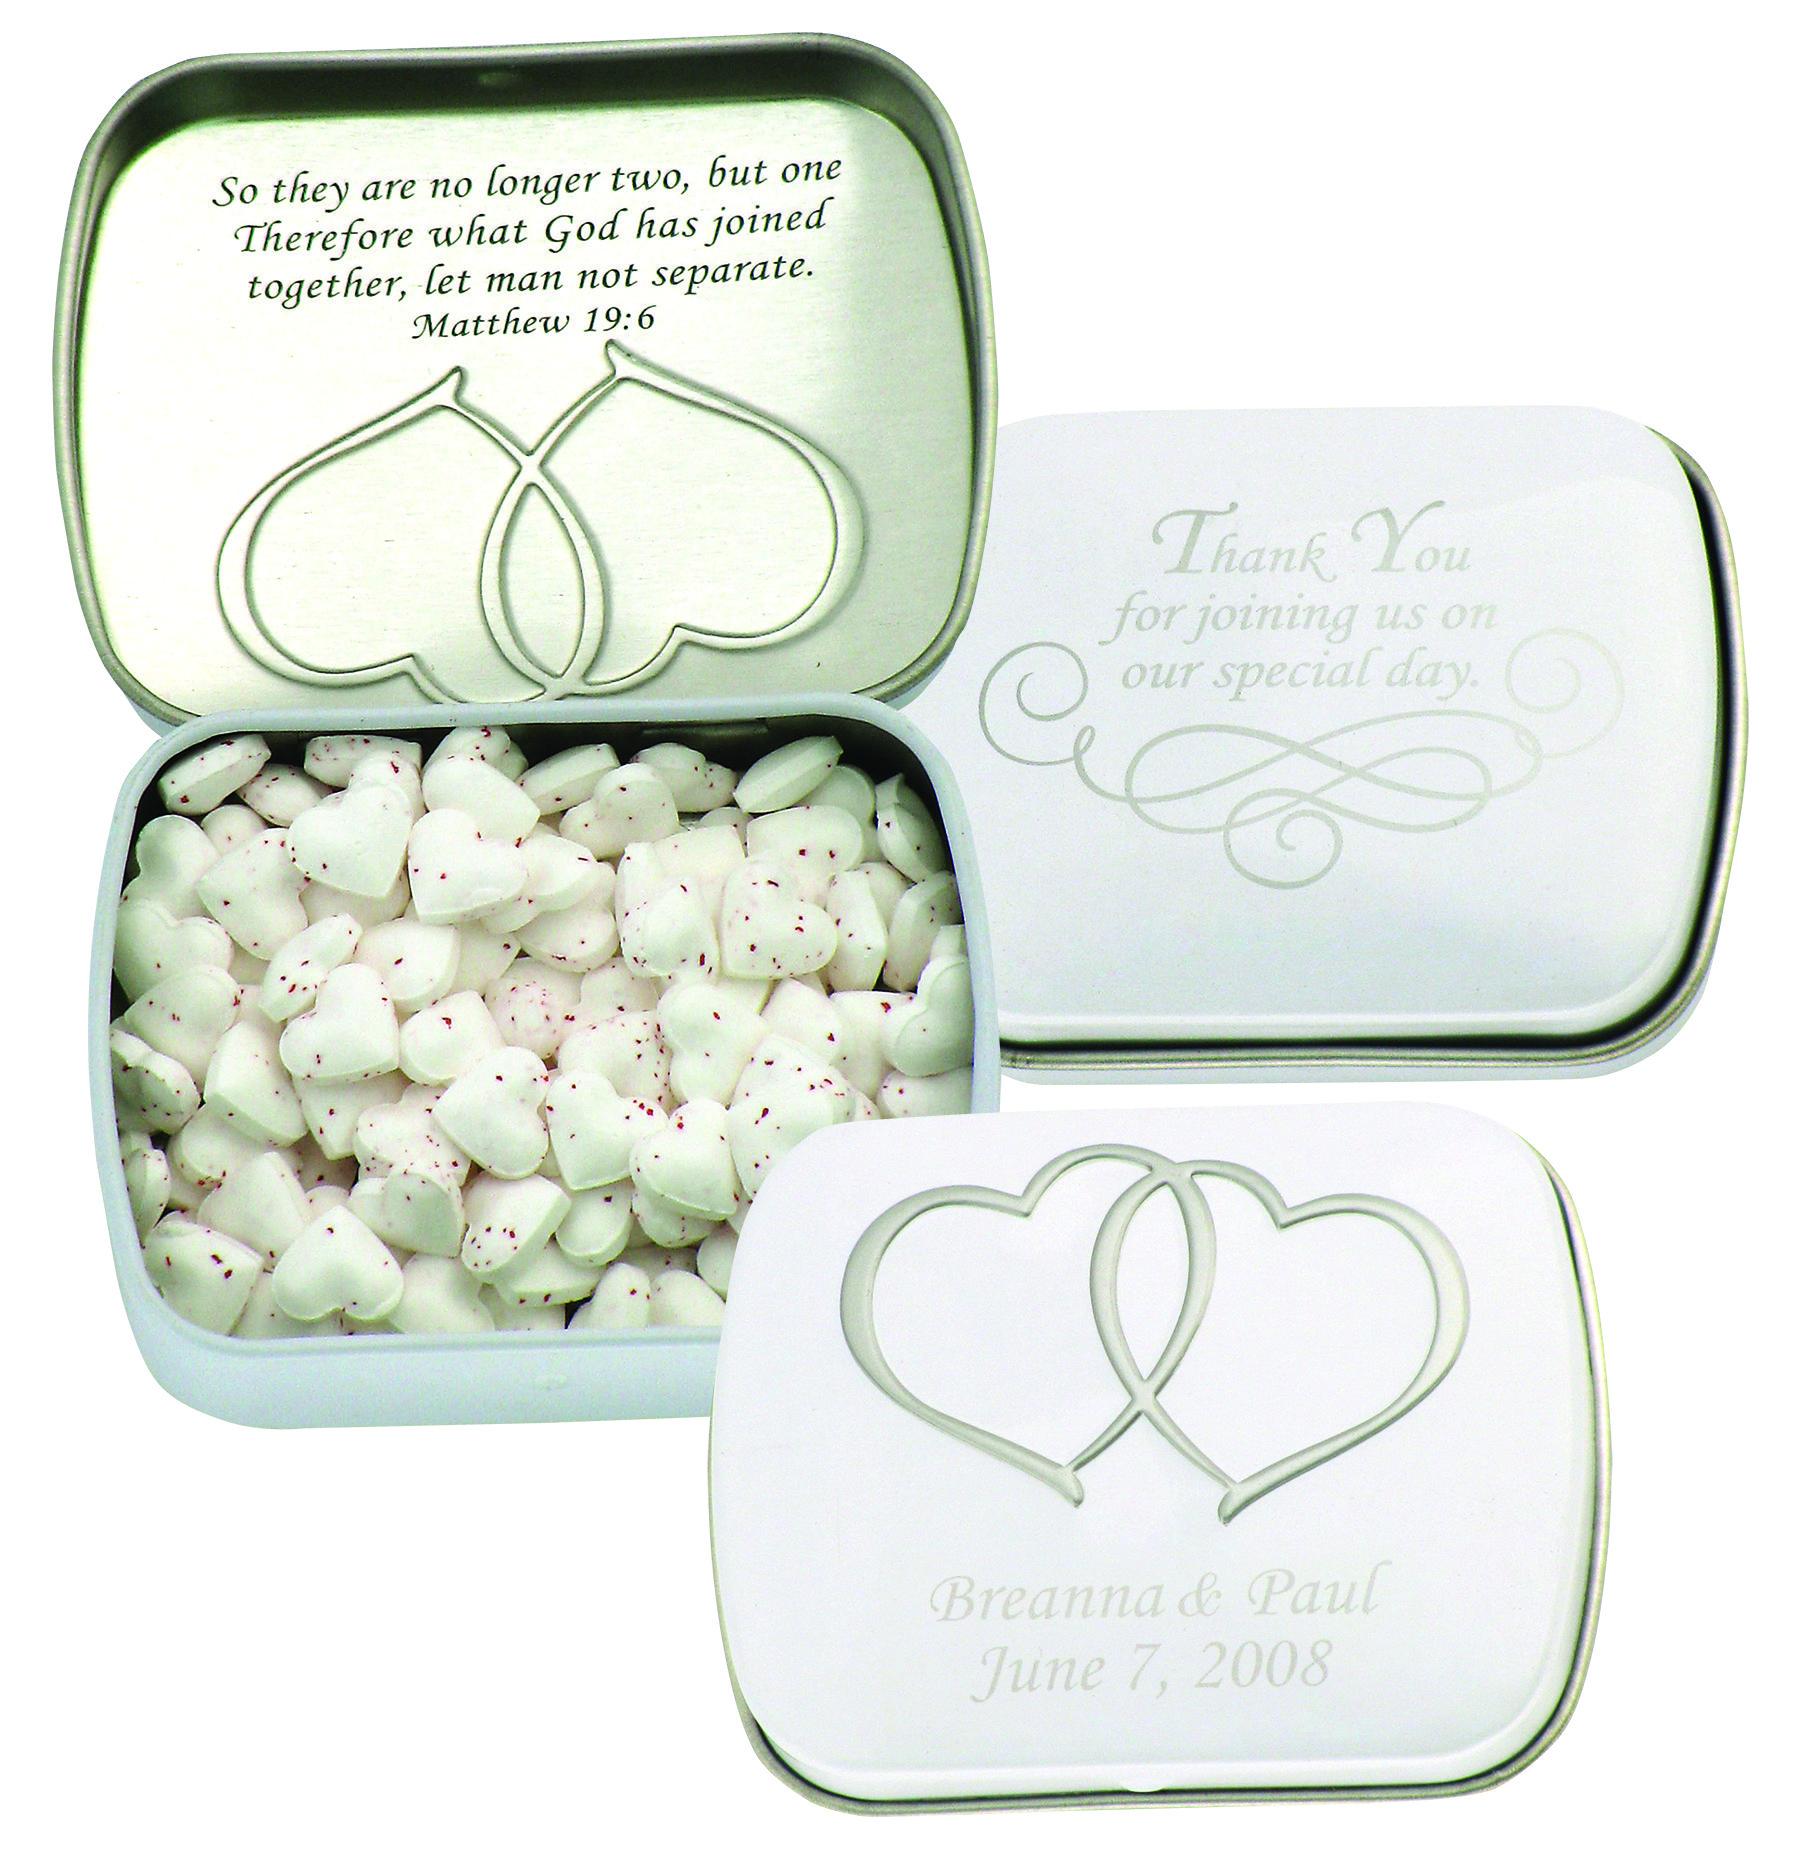 These beautiful wedding tins make perfect wedding favors to cherish ...